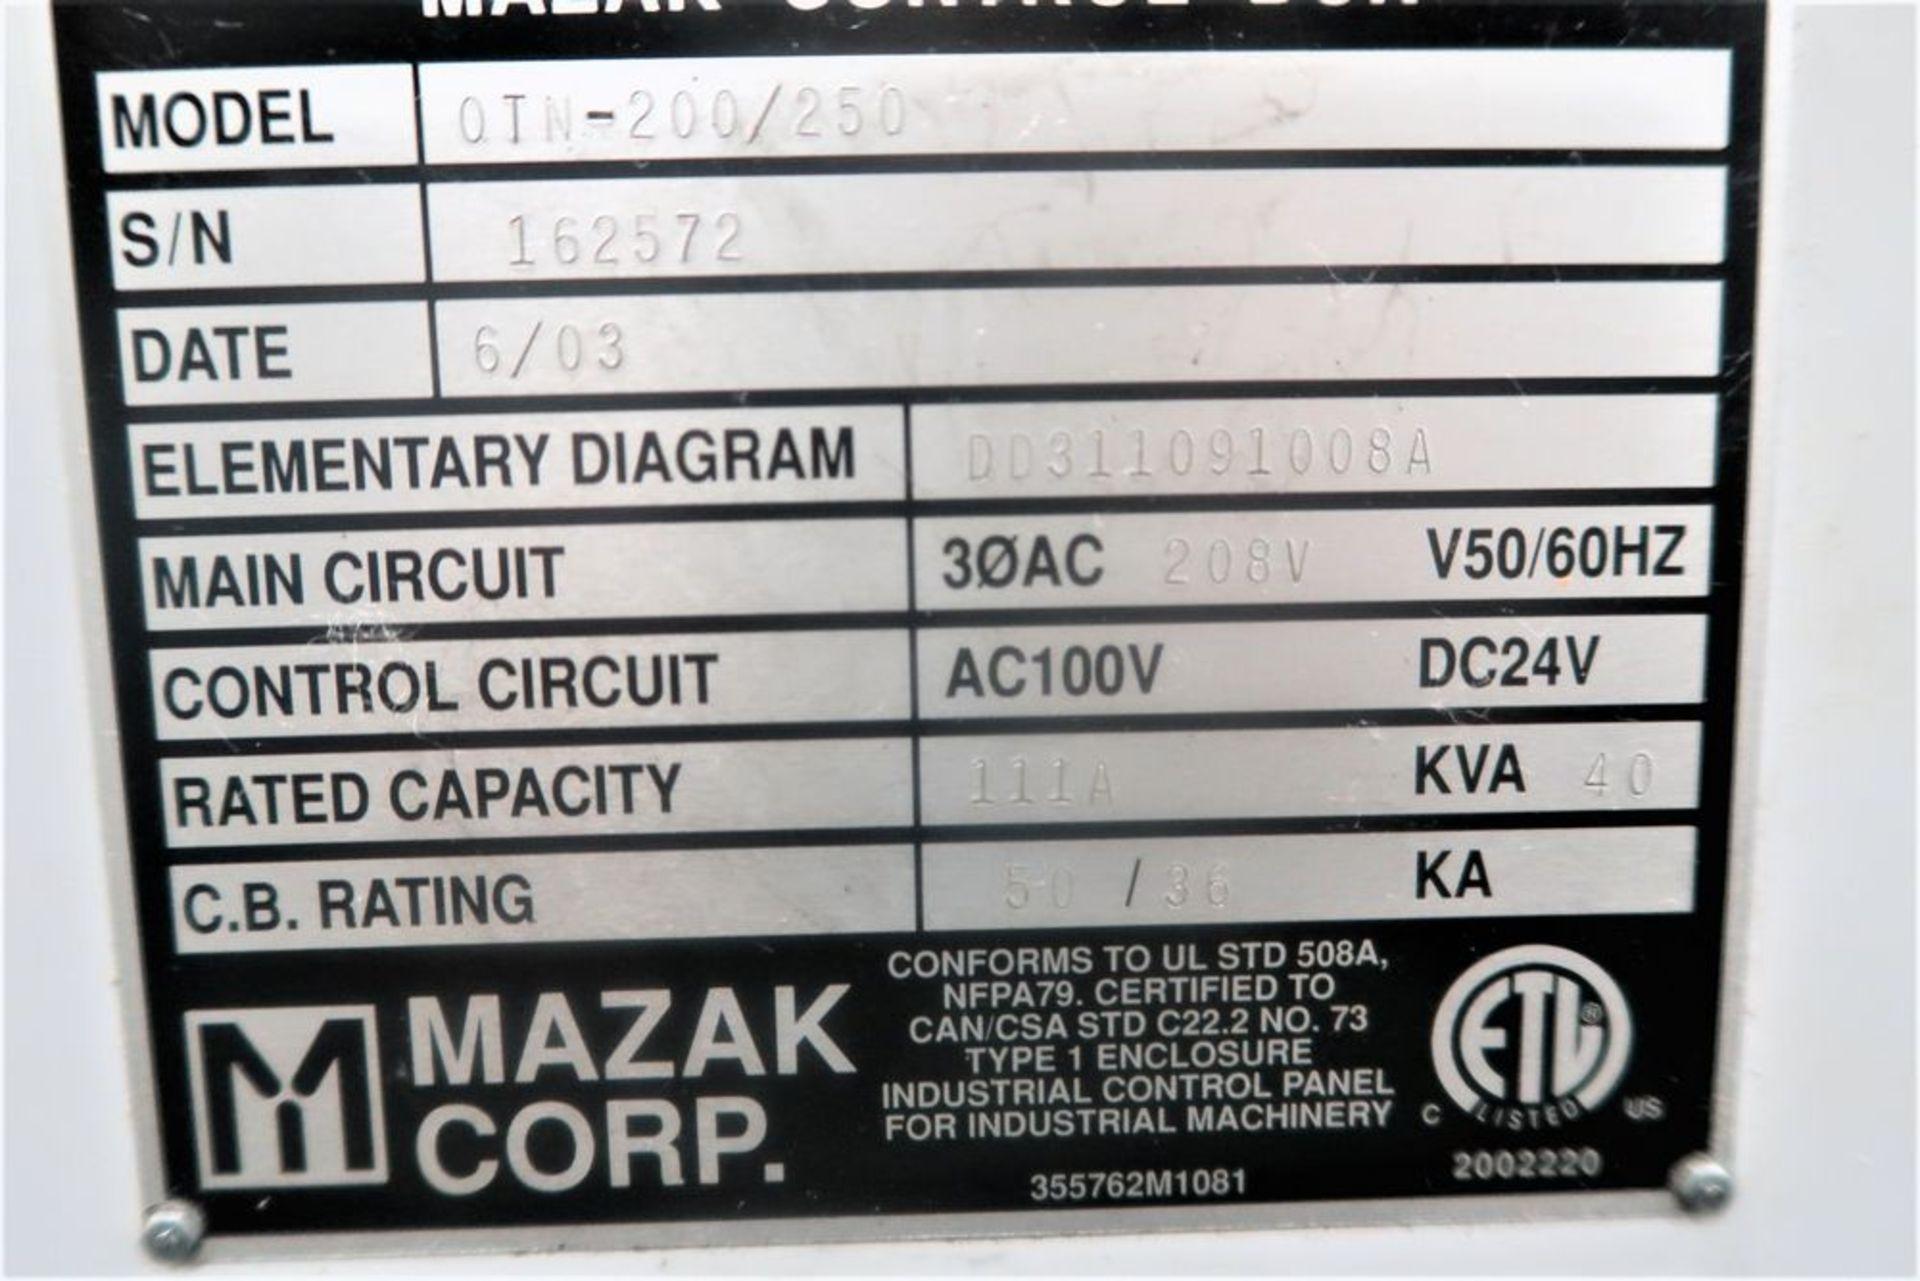 Lot 7 - Mazak Quick Turn Nexus 200 CNC 2-Axis Turning Center Lathe, S/n 162572